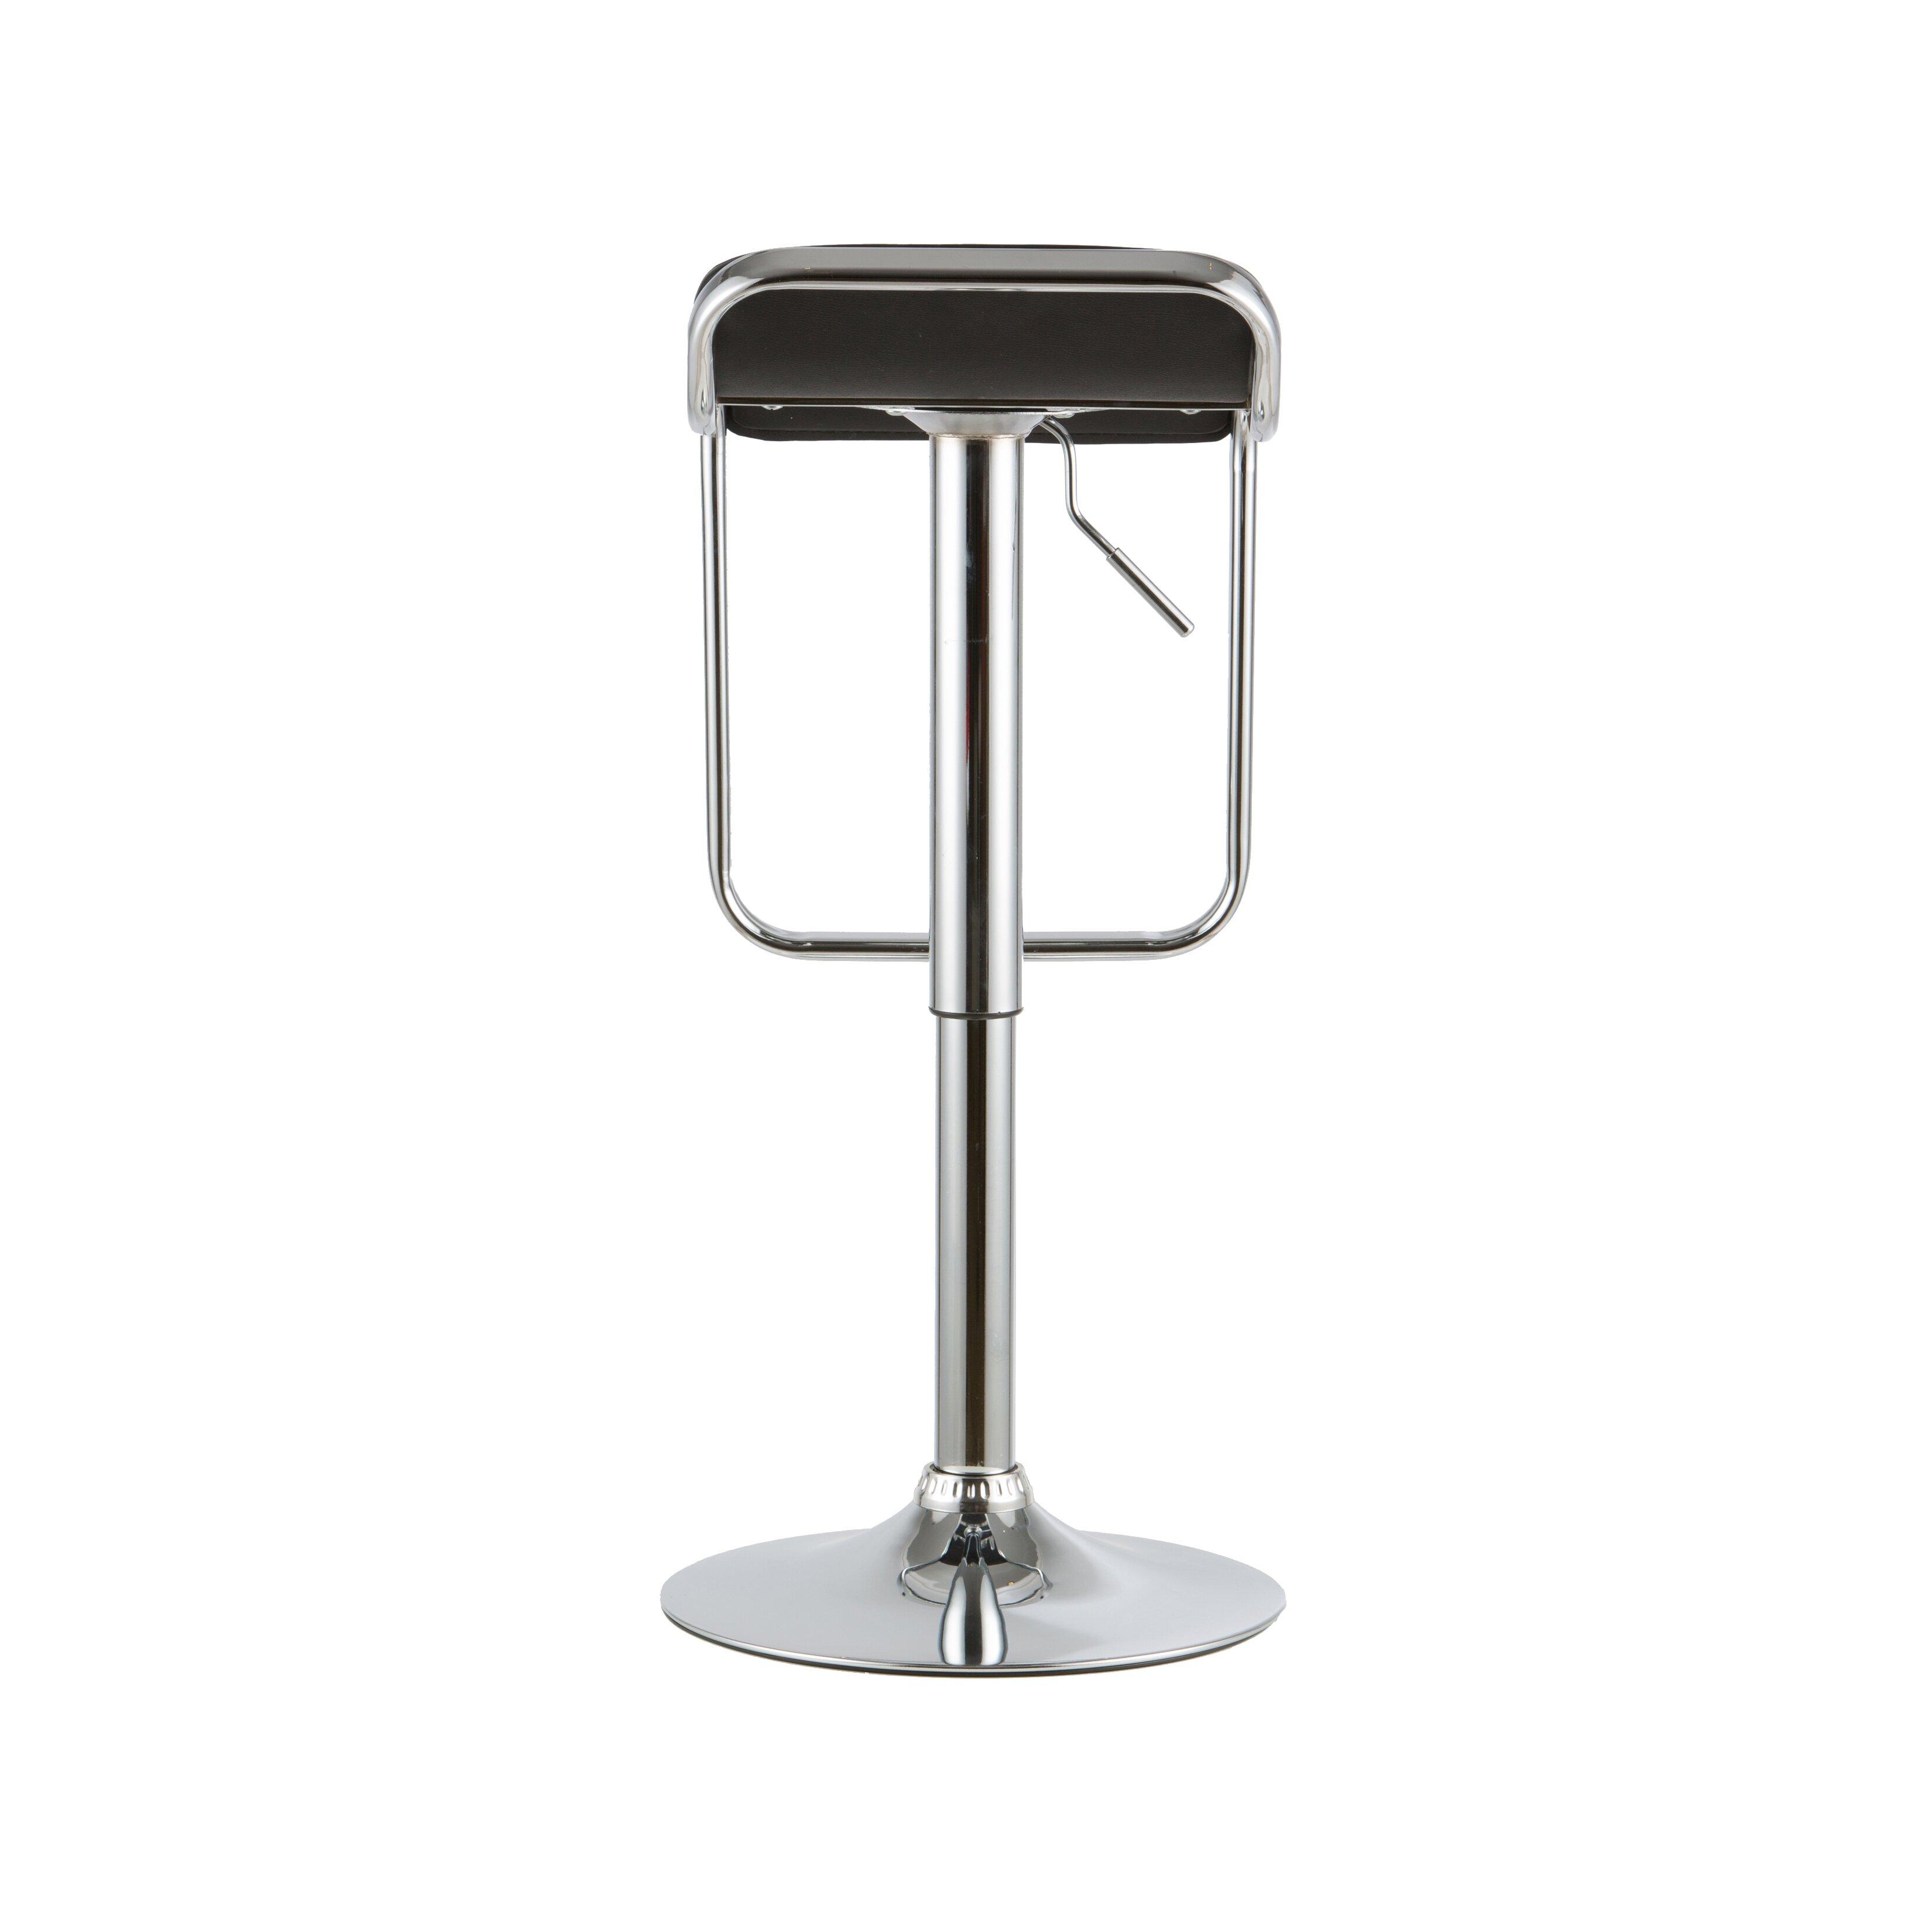 Attractiondesignhome 2 Piece Adjustable Height Swivel Bar Stool Set Wayfair